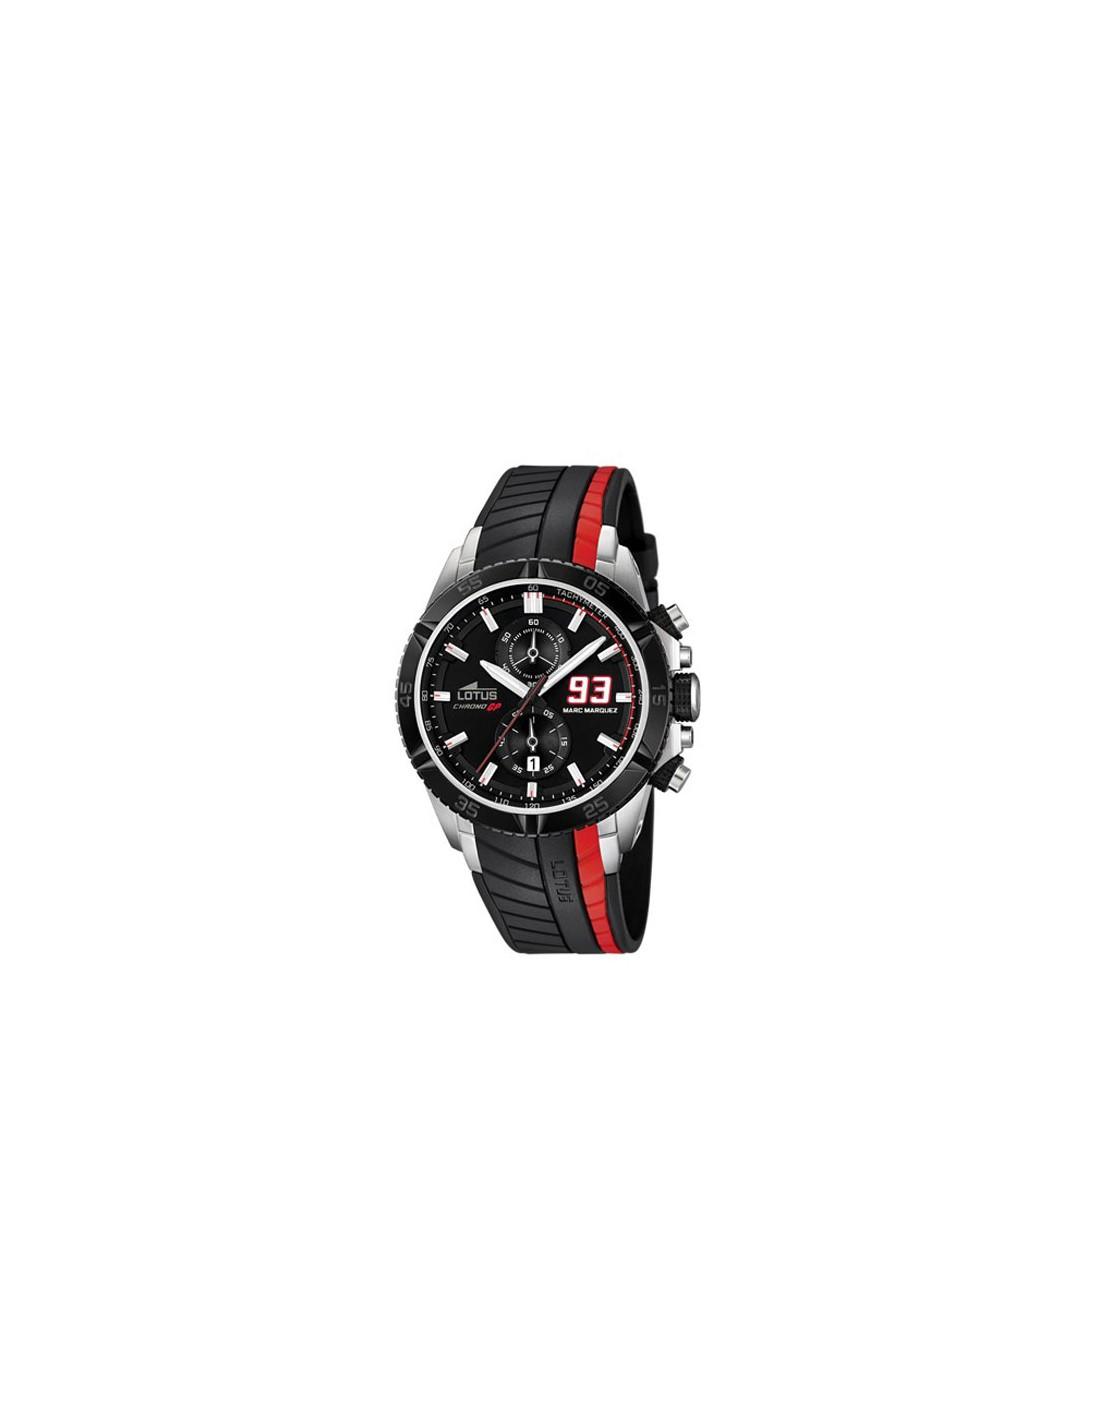 4c7d3b5ebd57 Reloj Lotus Marc Márquez L18103 3